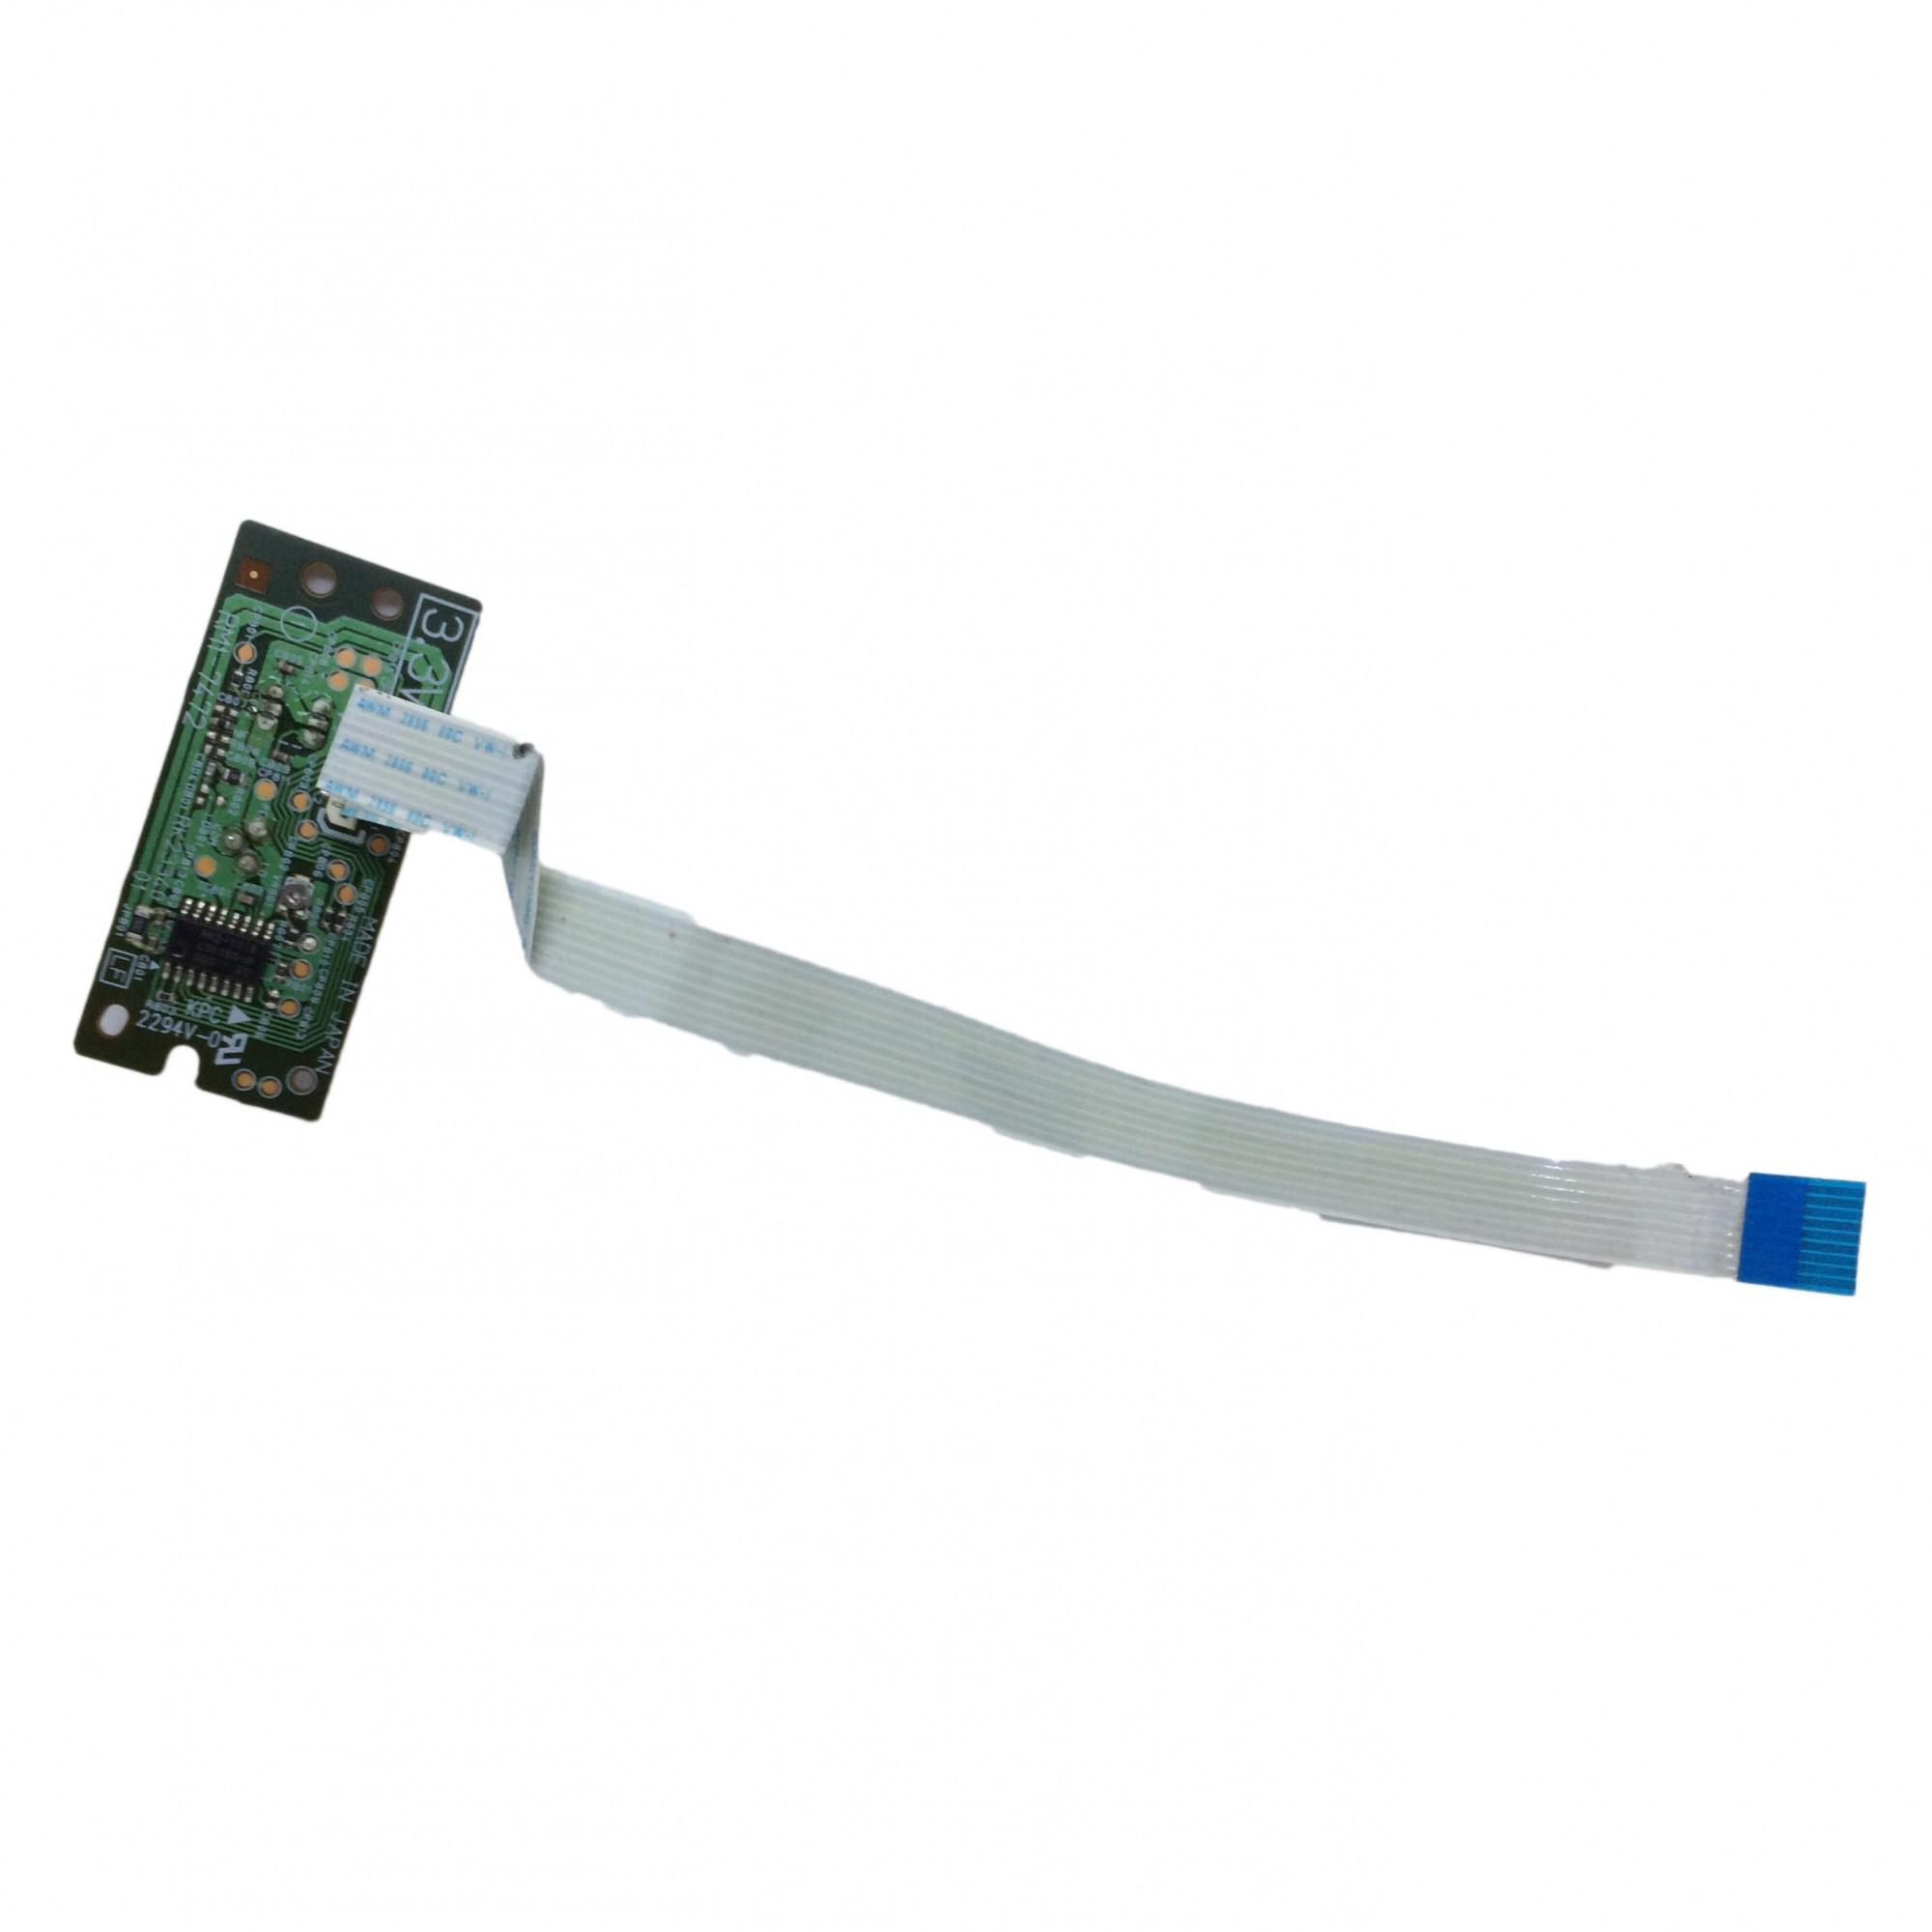 Placa Laser + Cabo Flat e sensor Multifuncional HP M1212 PN:rk23340 - Retirado